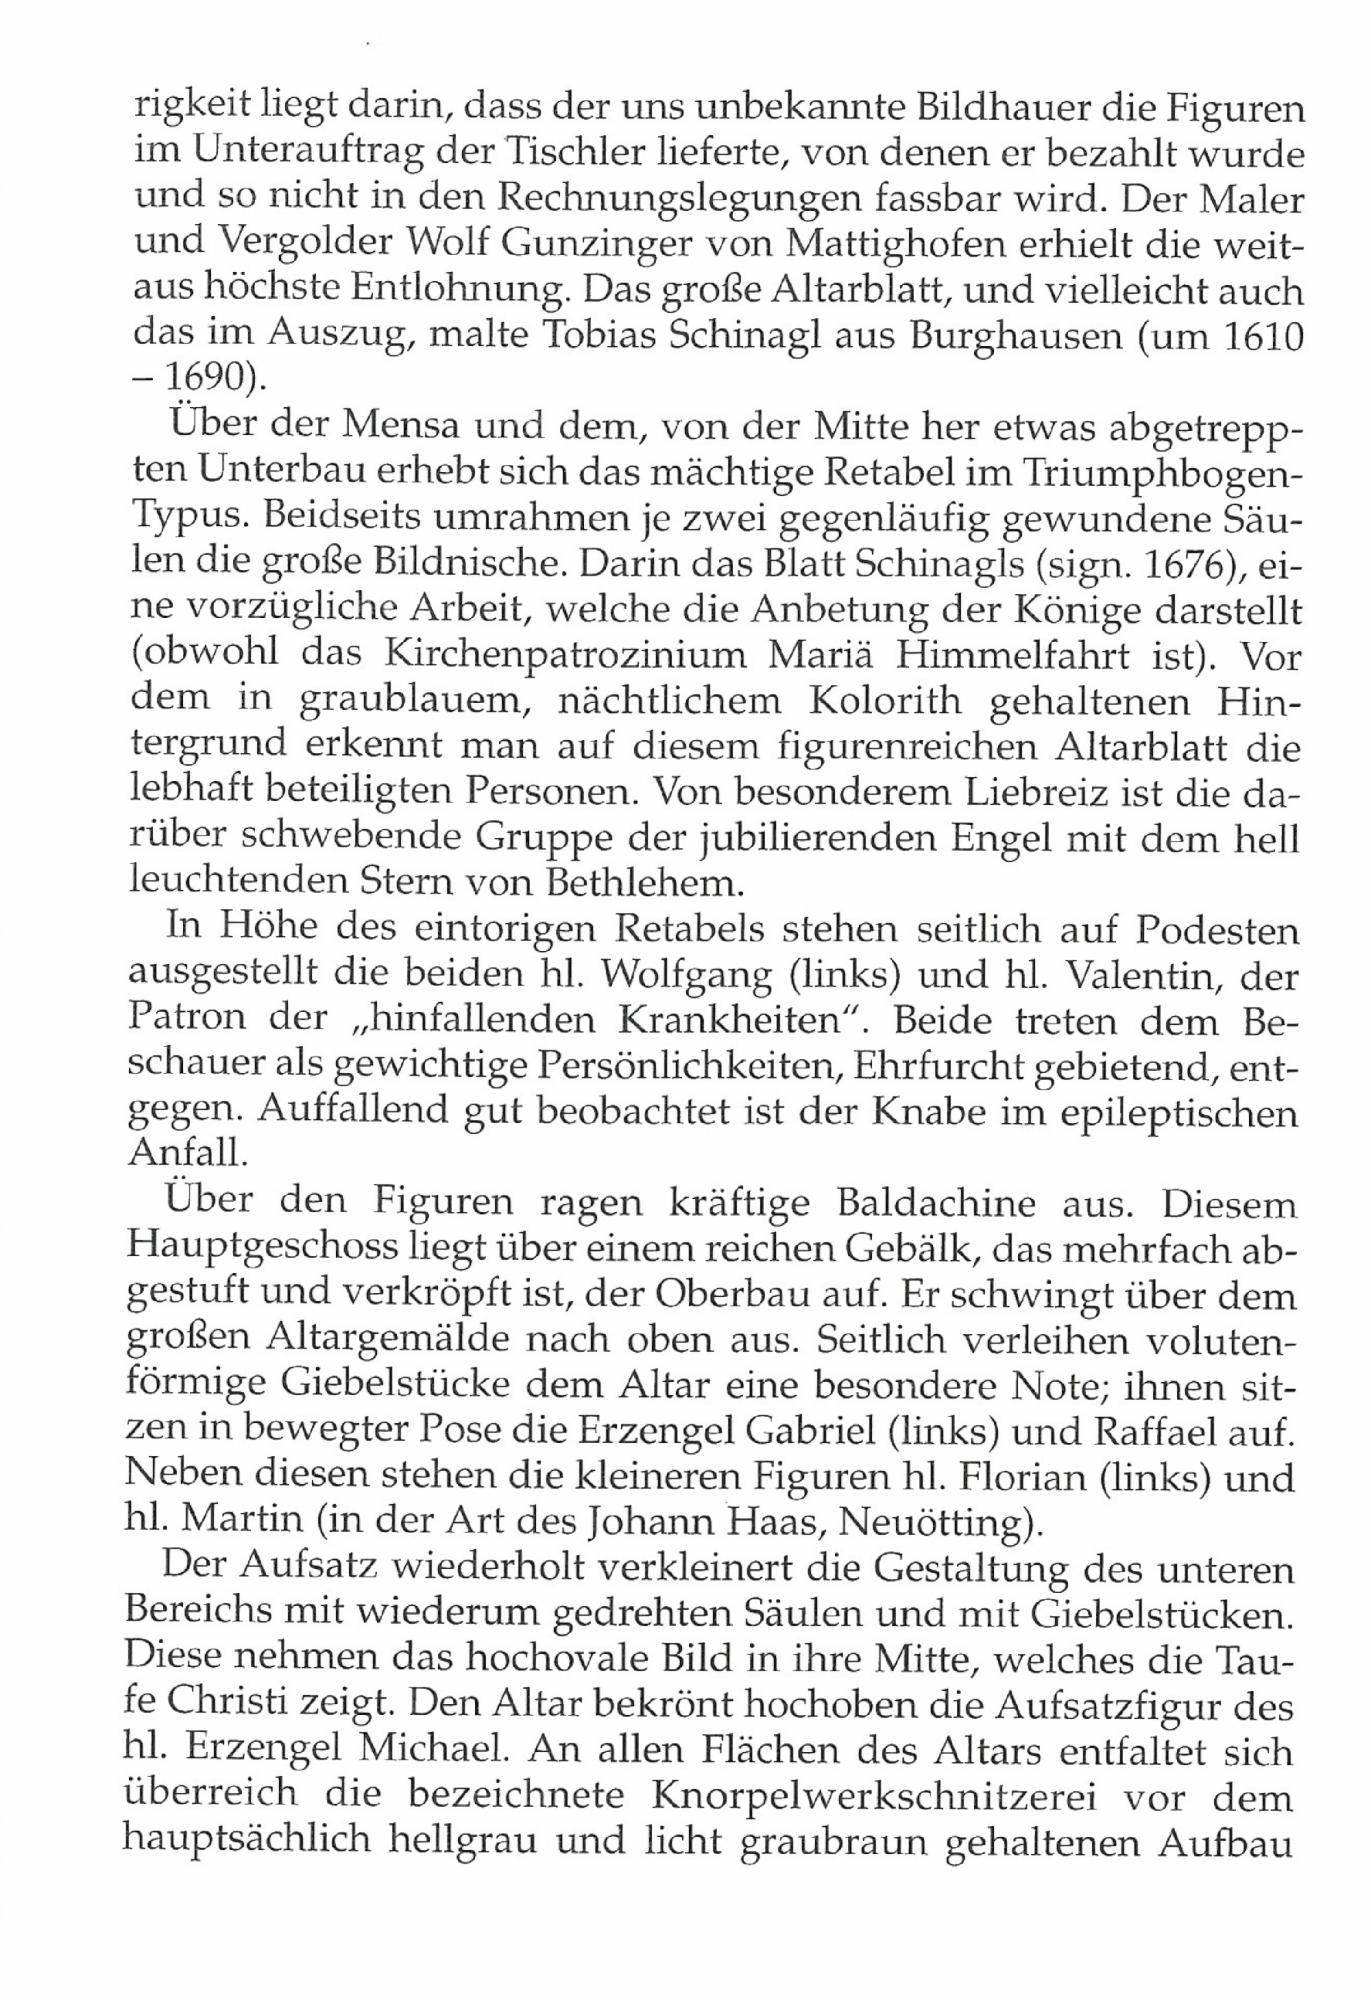 Erlach Kirchenführer 014